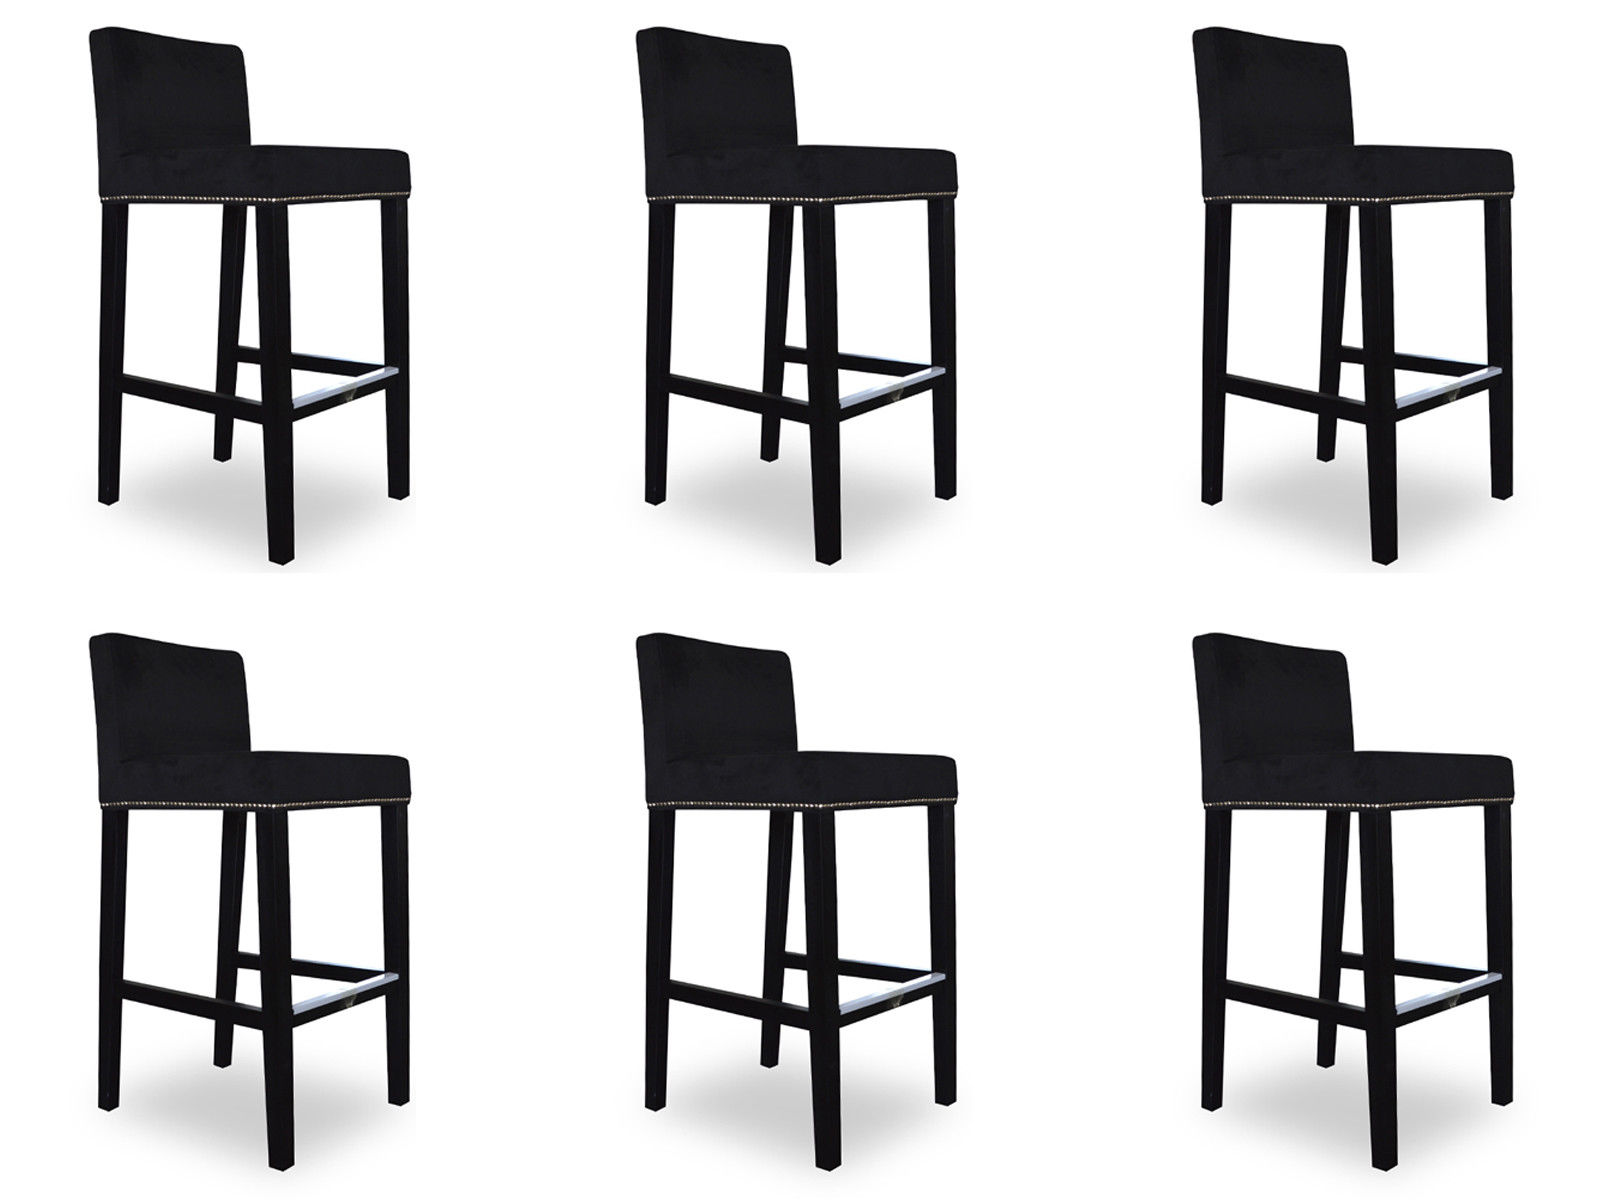 6 Er Set Barhocker Hocker Esszimmer Stuhl Stühle Bar Günstig Schweiz